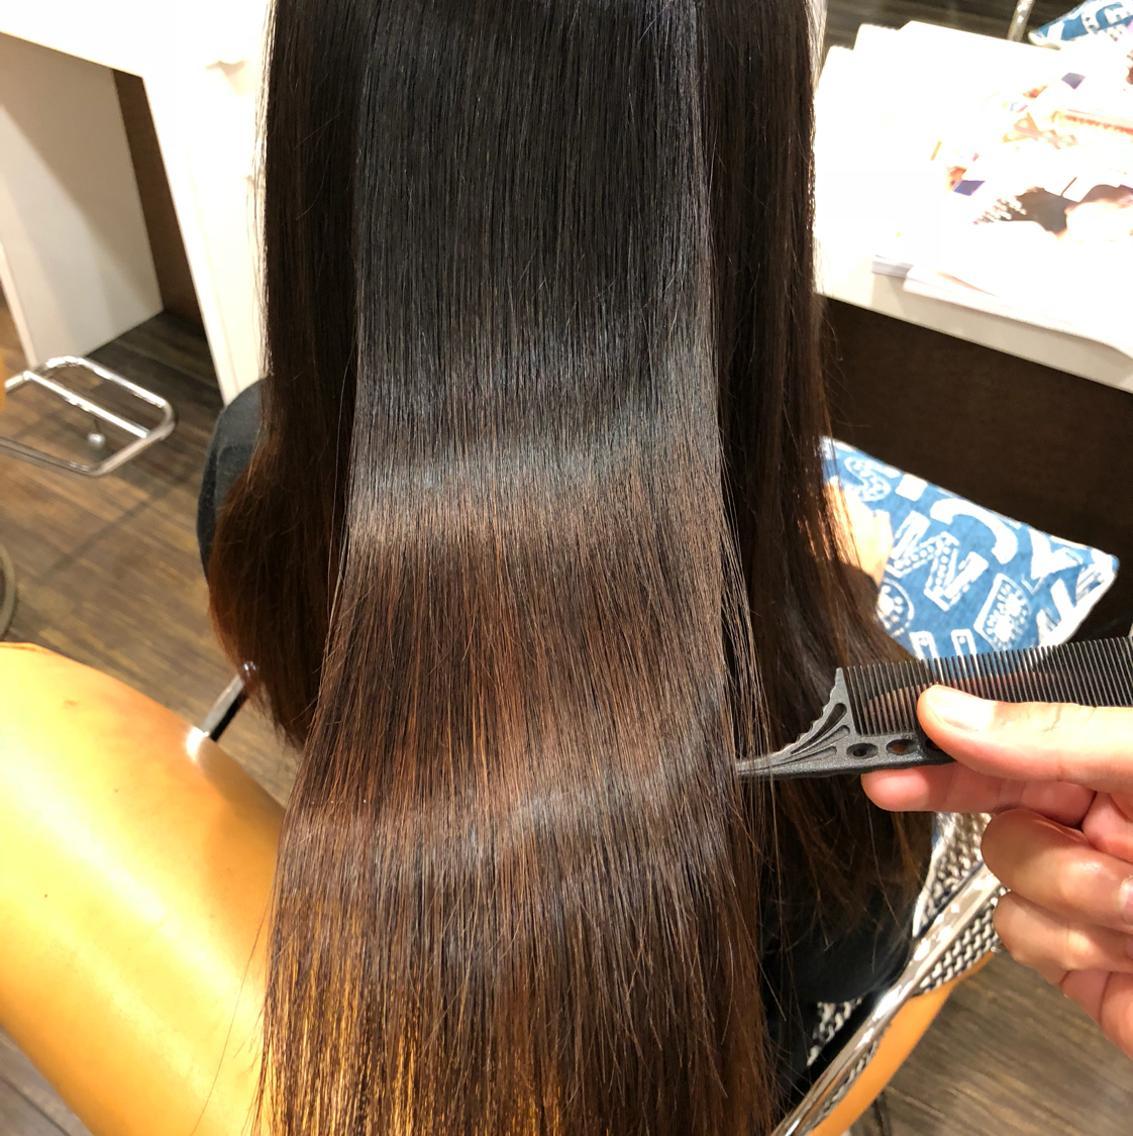 髪質改善☆縮毛矯正!圧倒的ツヤ髪!